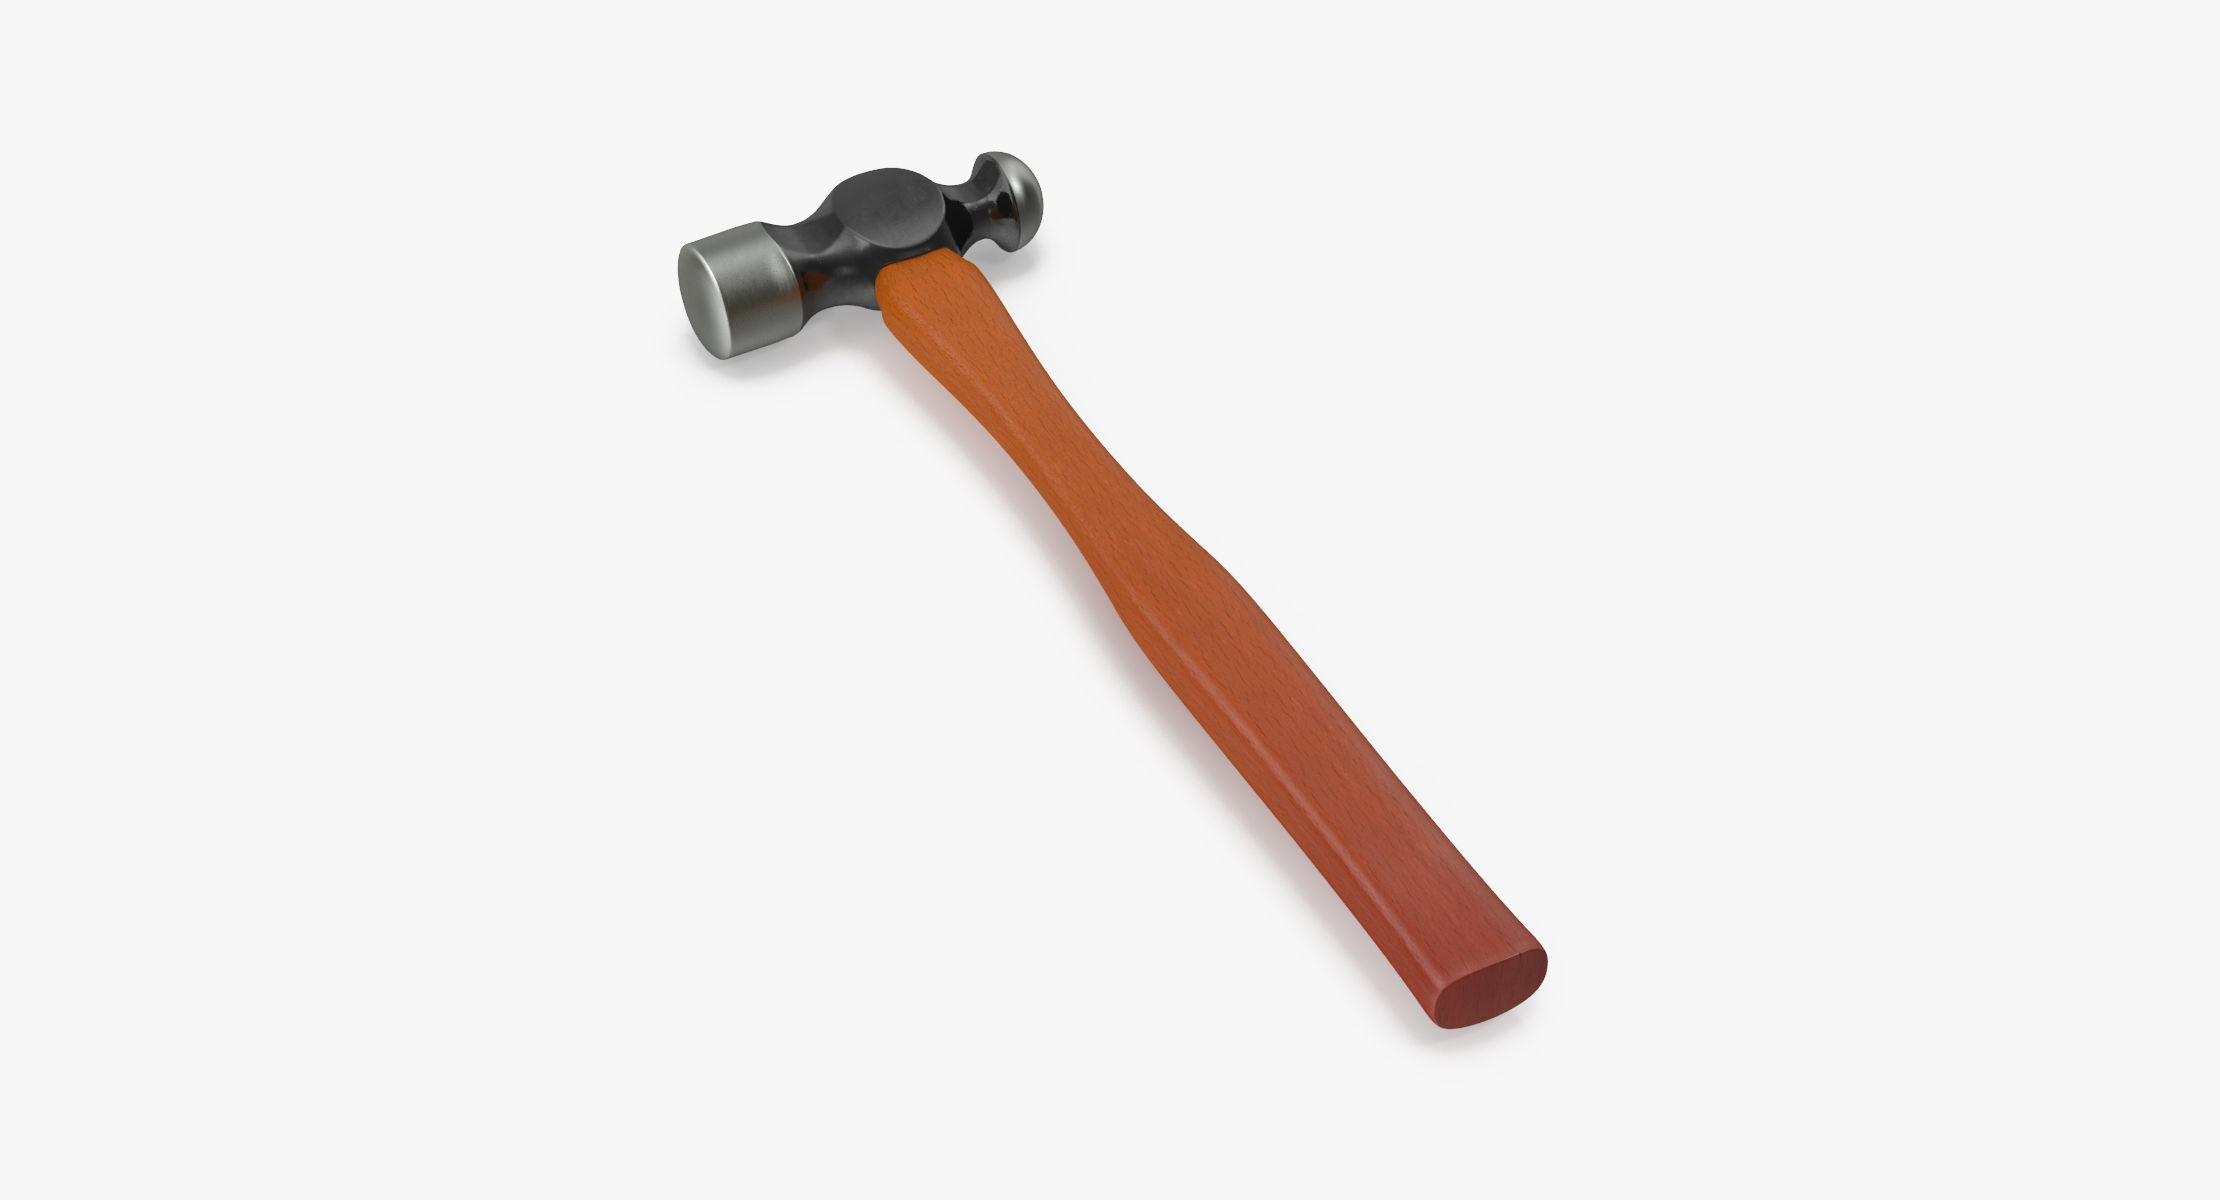 Ball Peen Hammer - reel 1